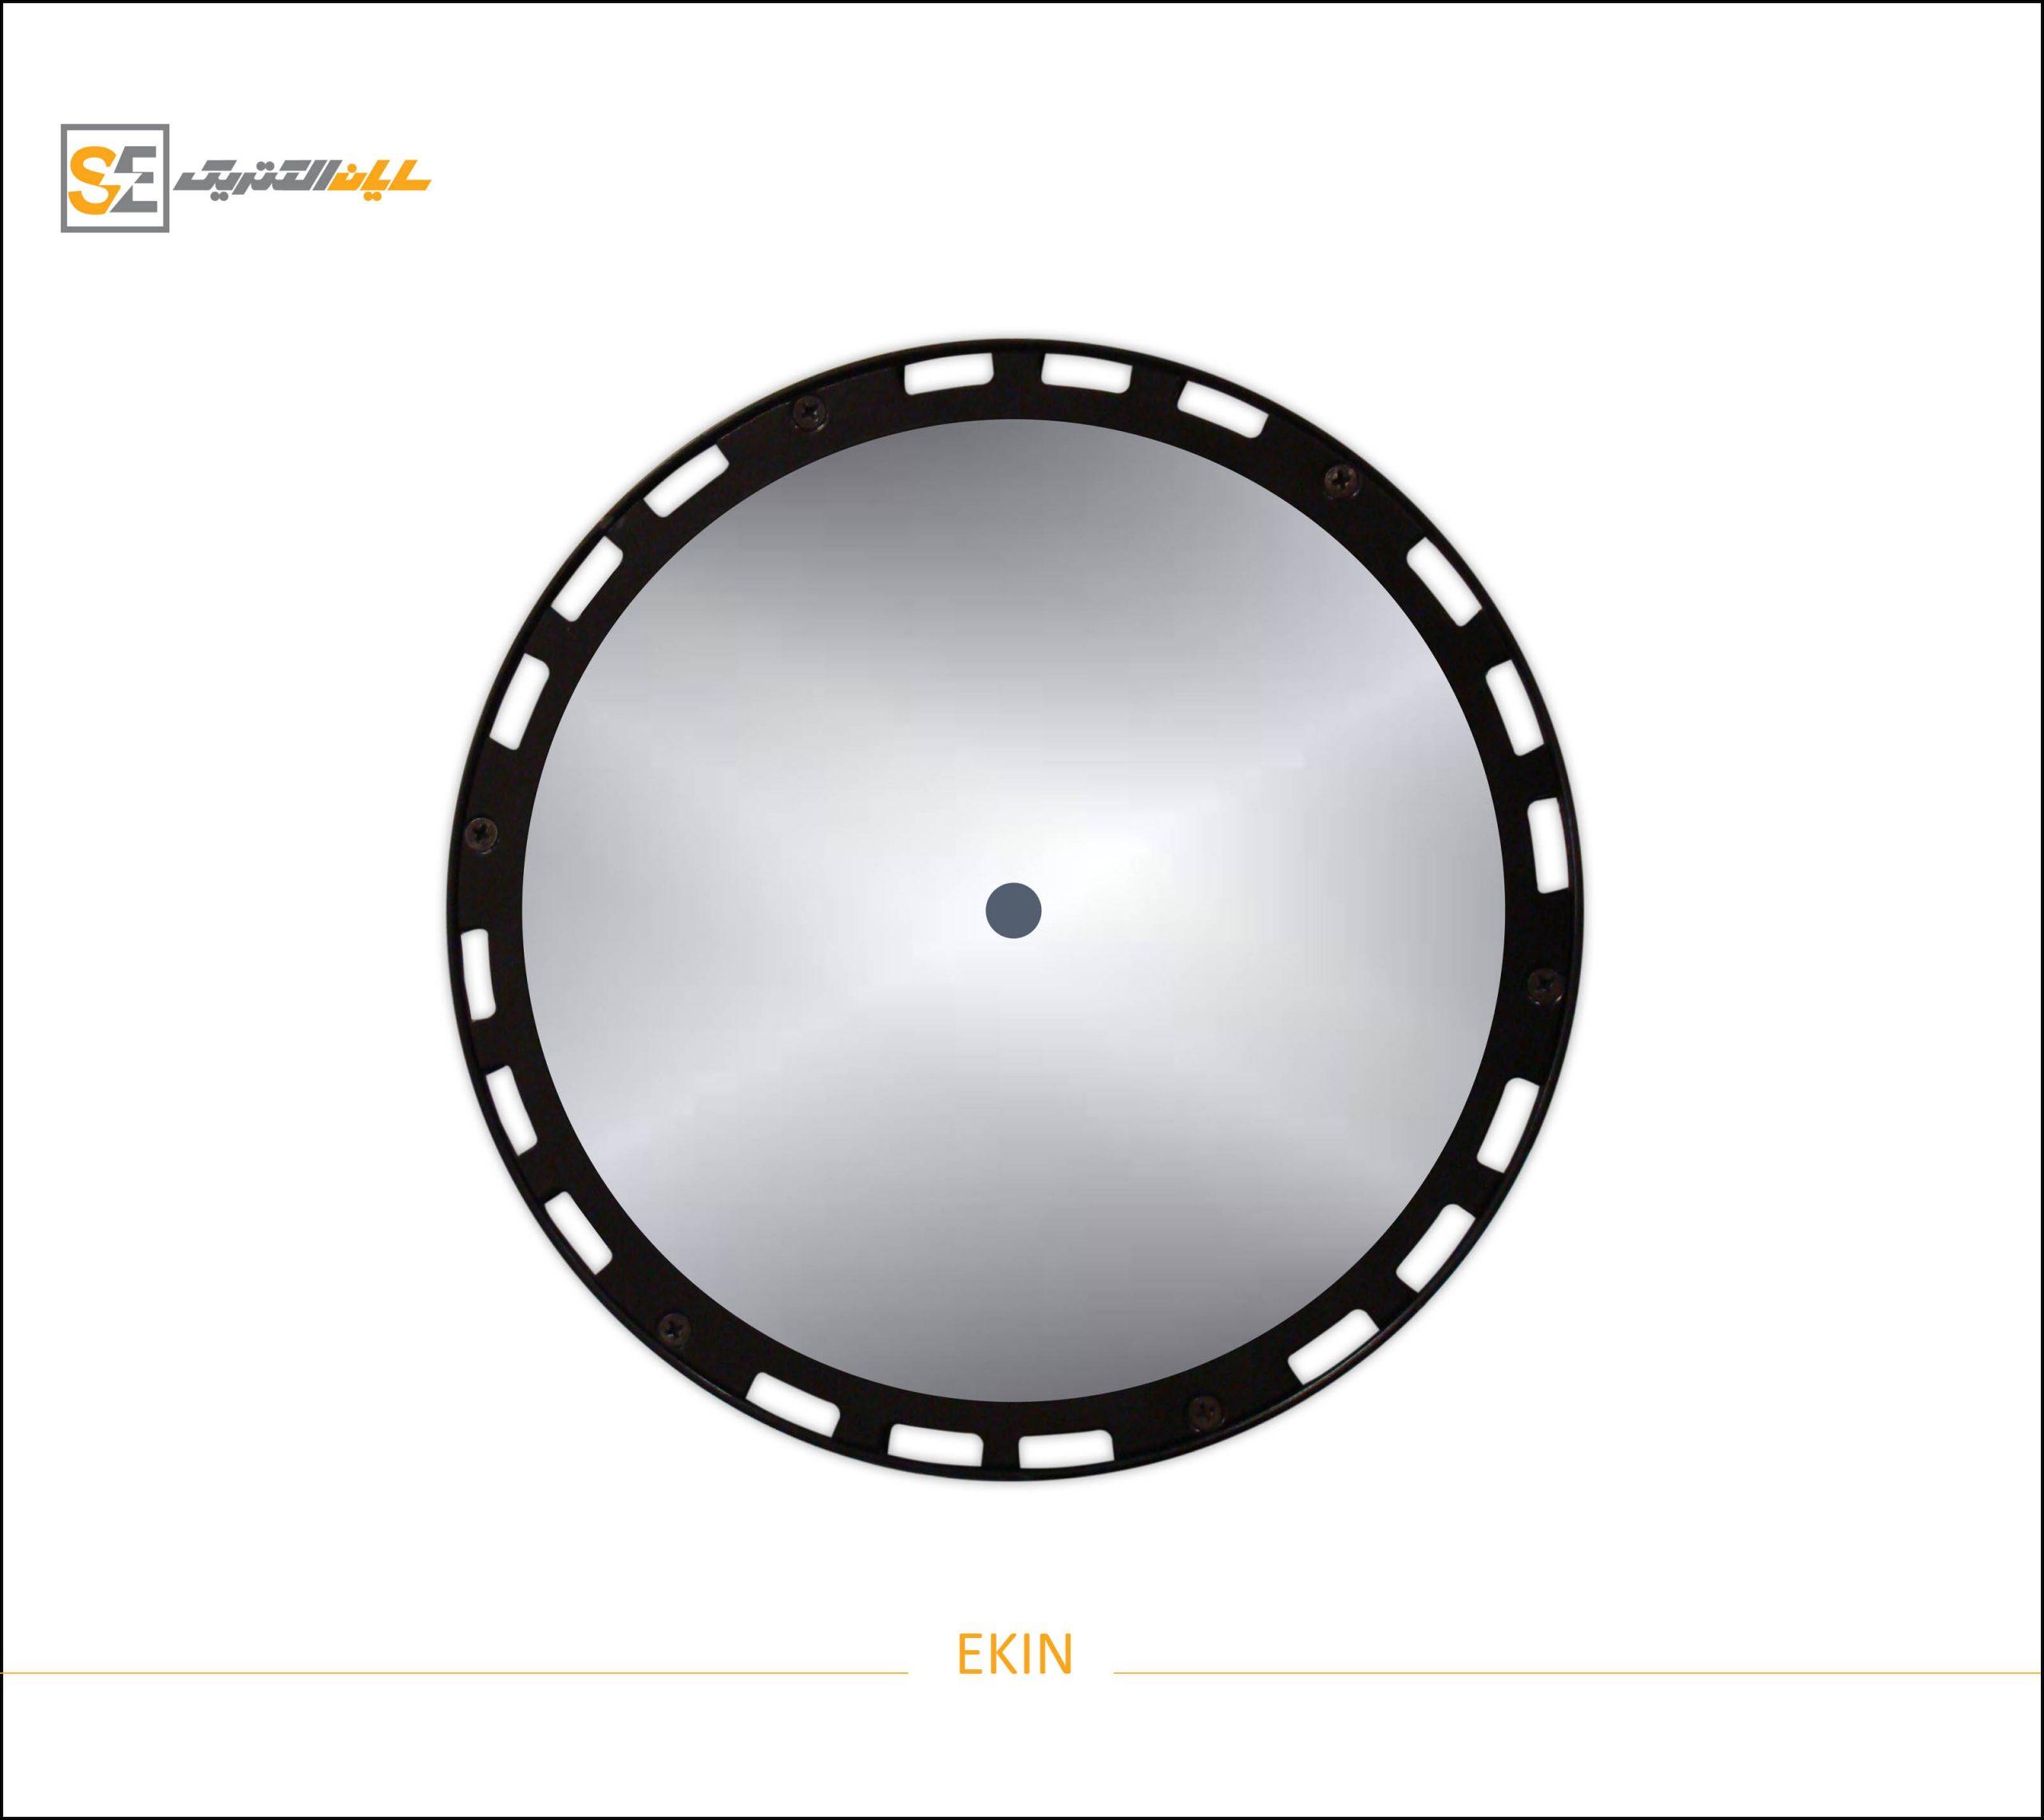 ekin01